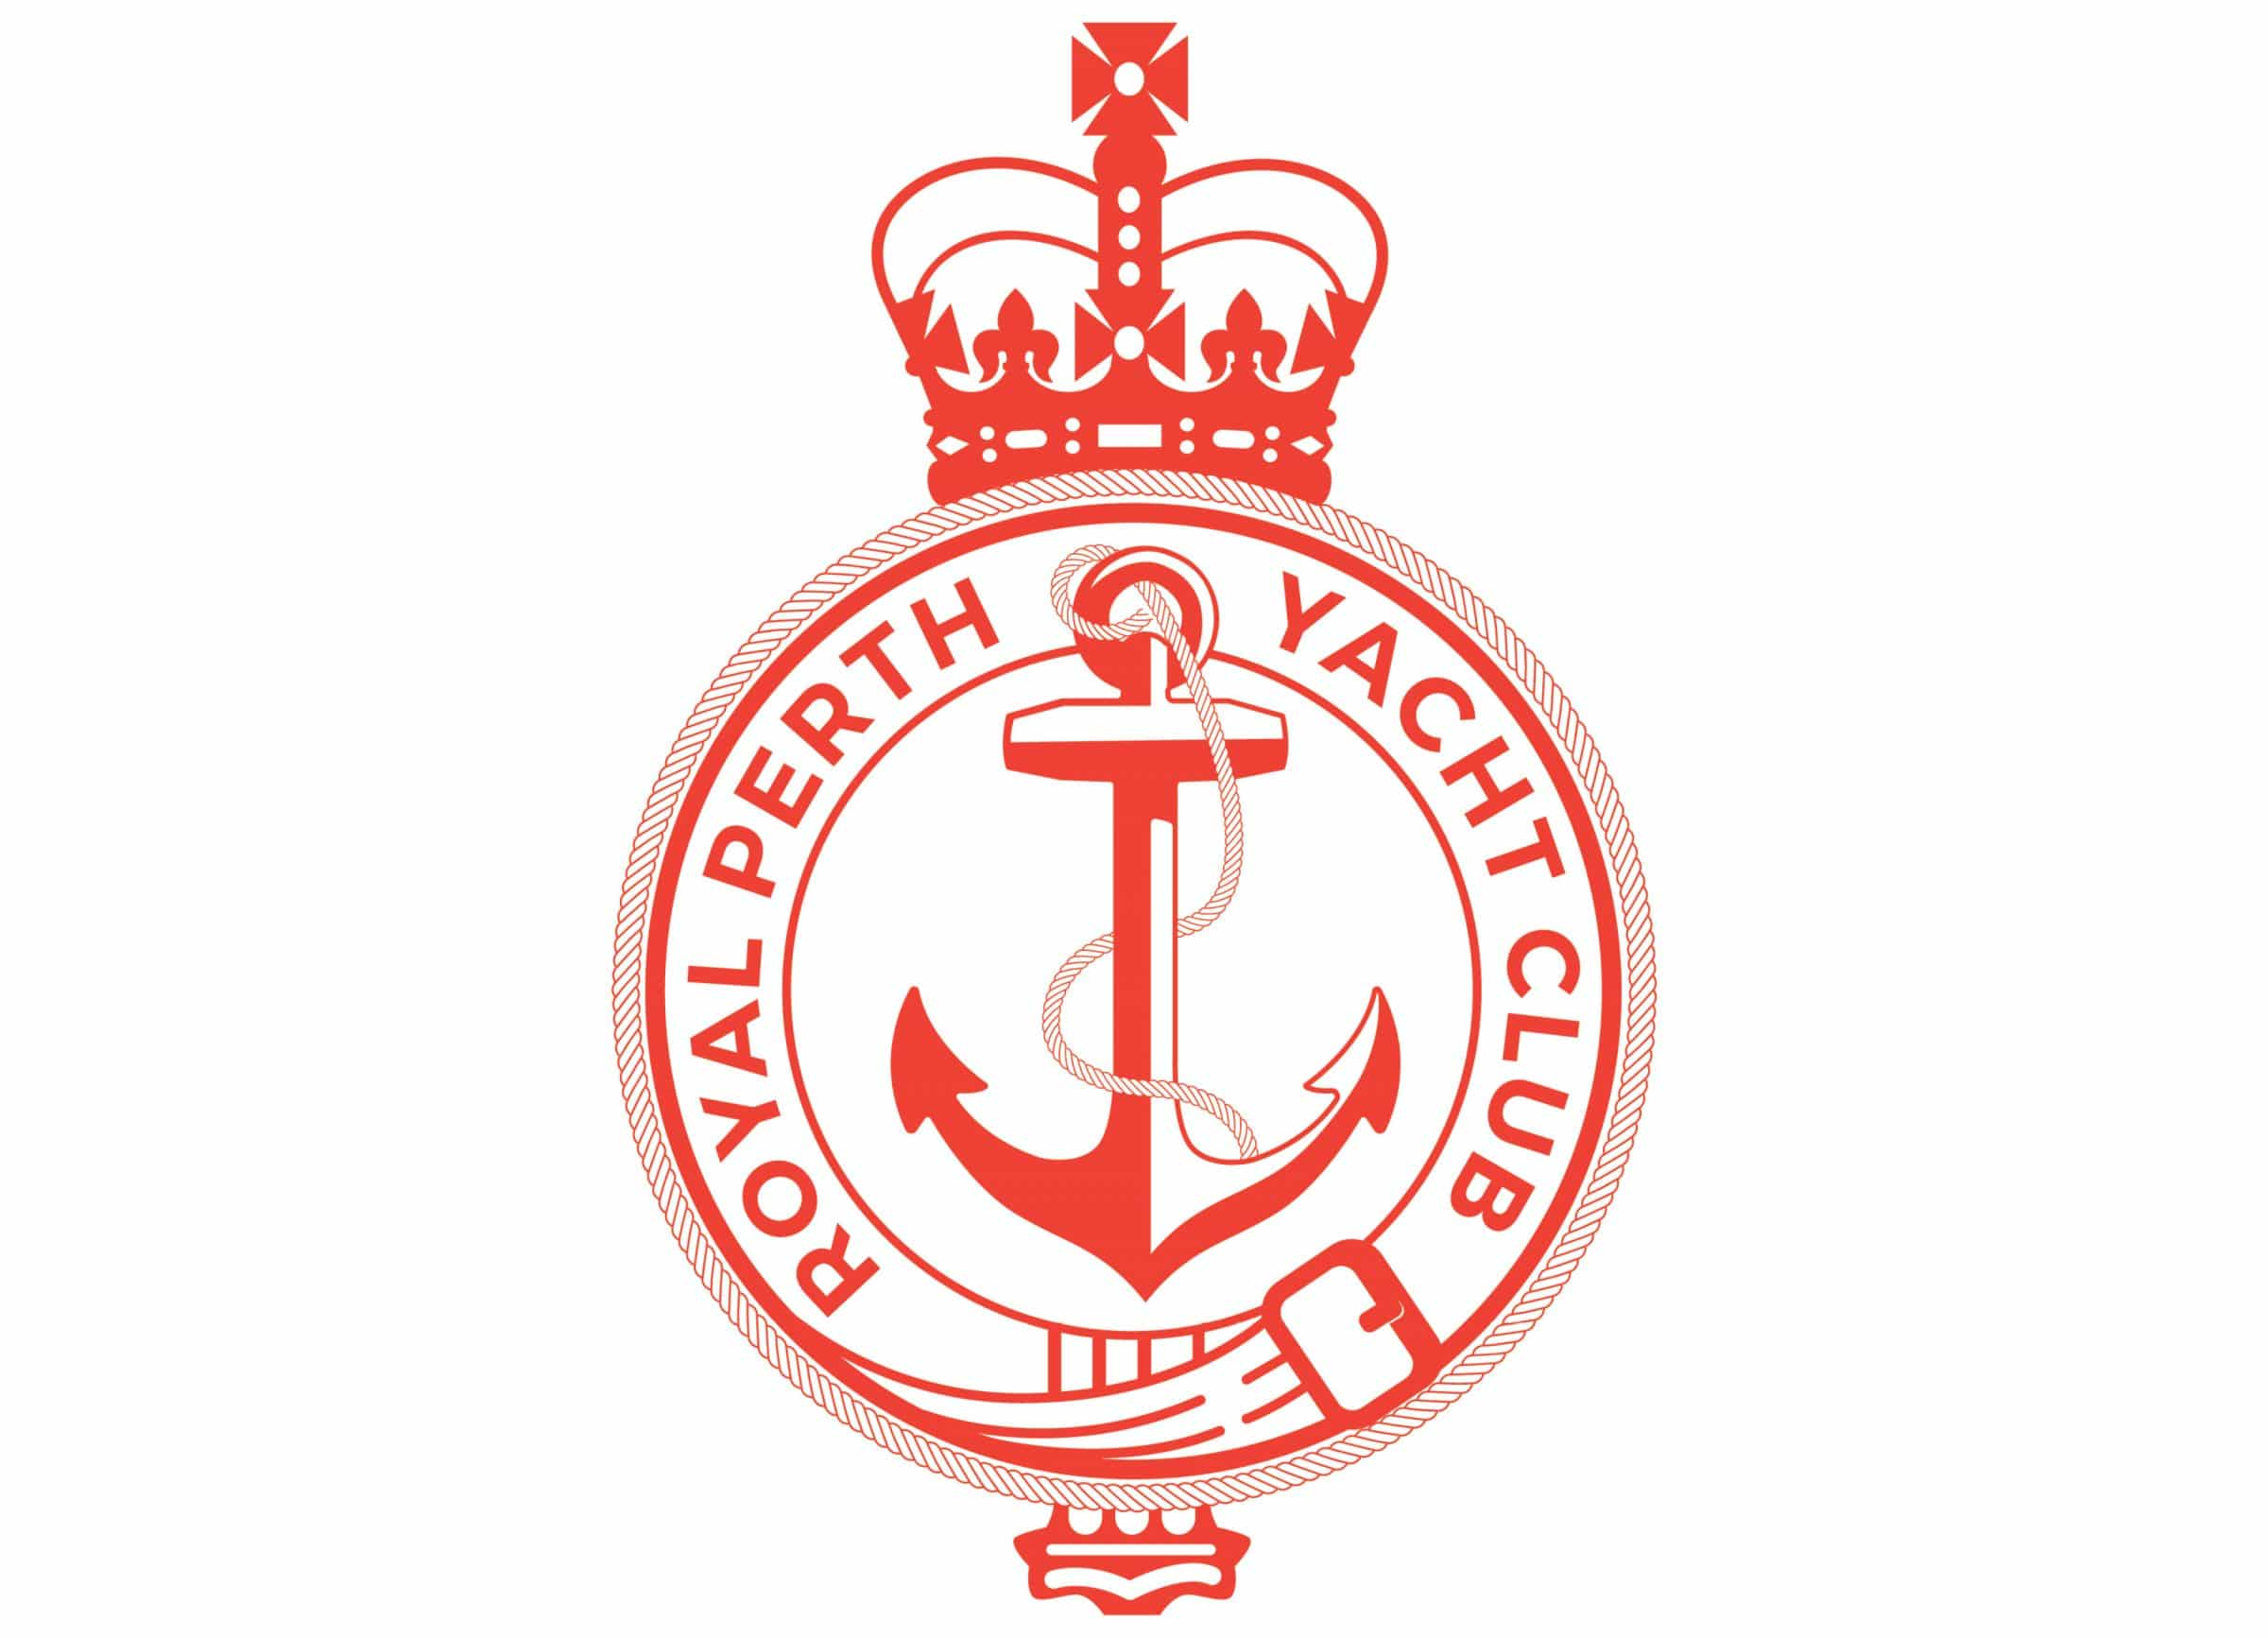 royal perth yacht club logo